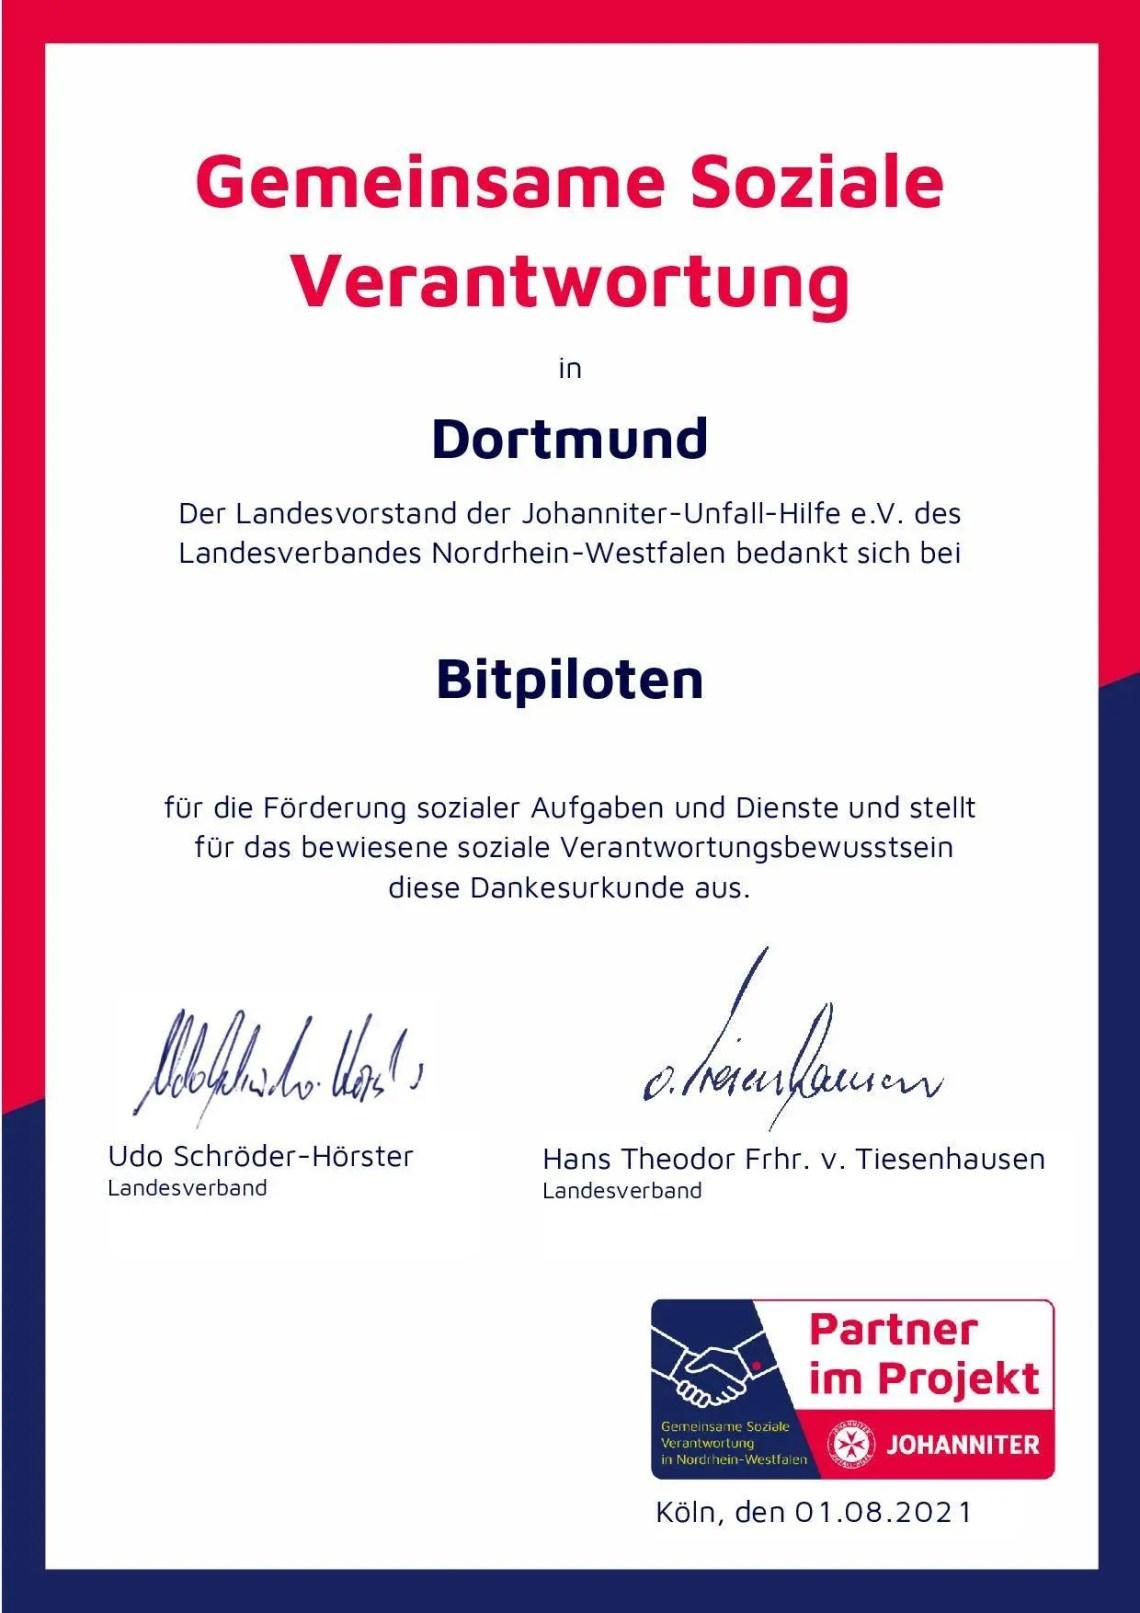 bitpiloten & Johanniter